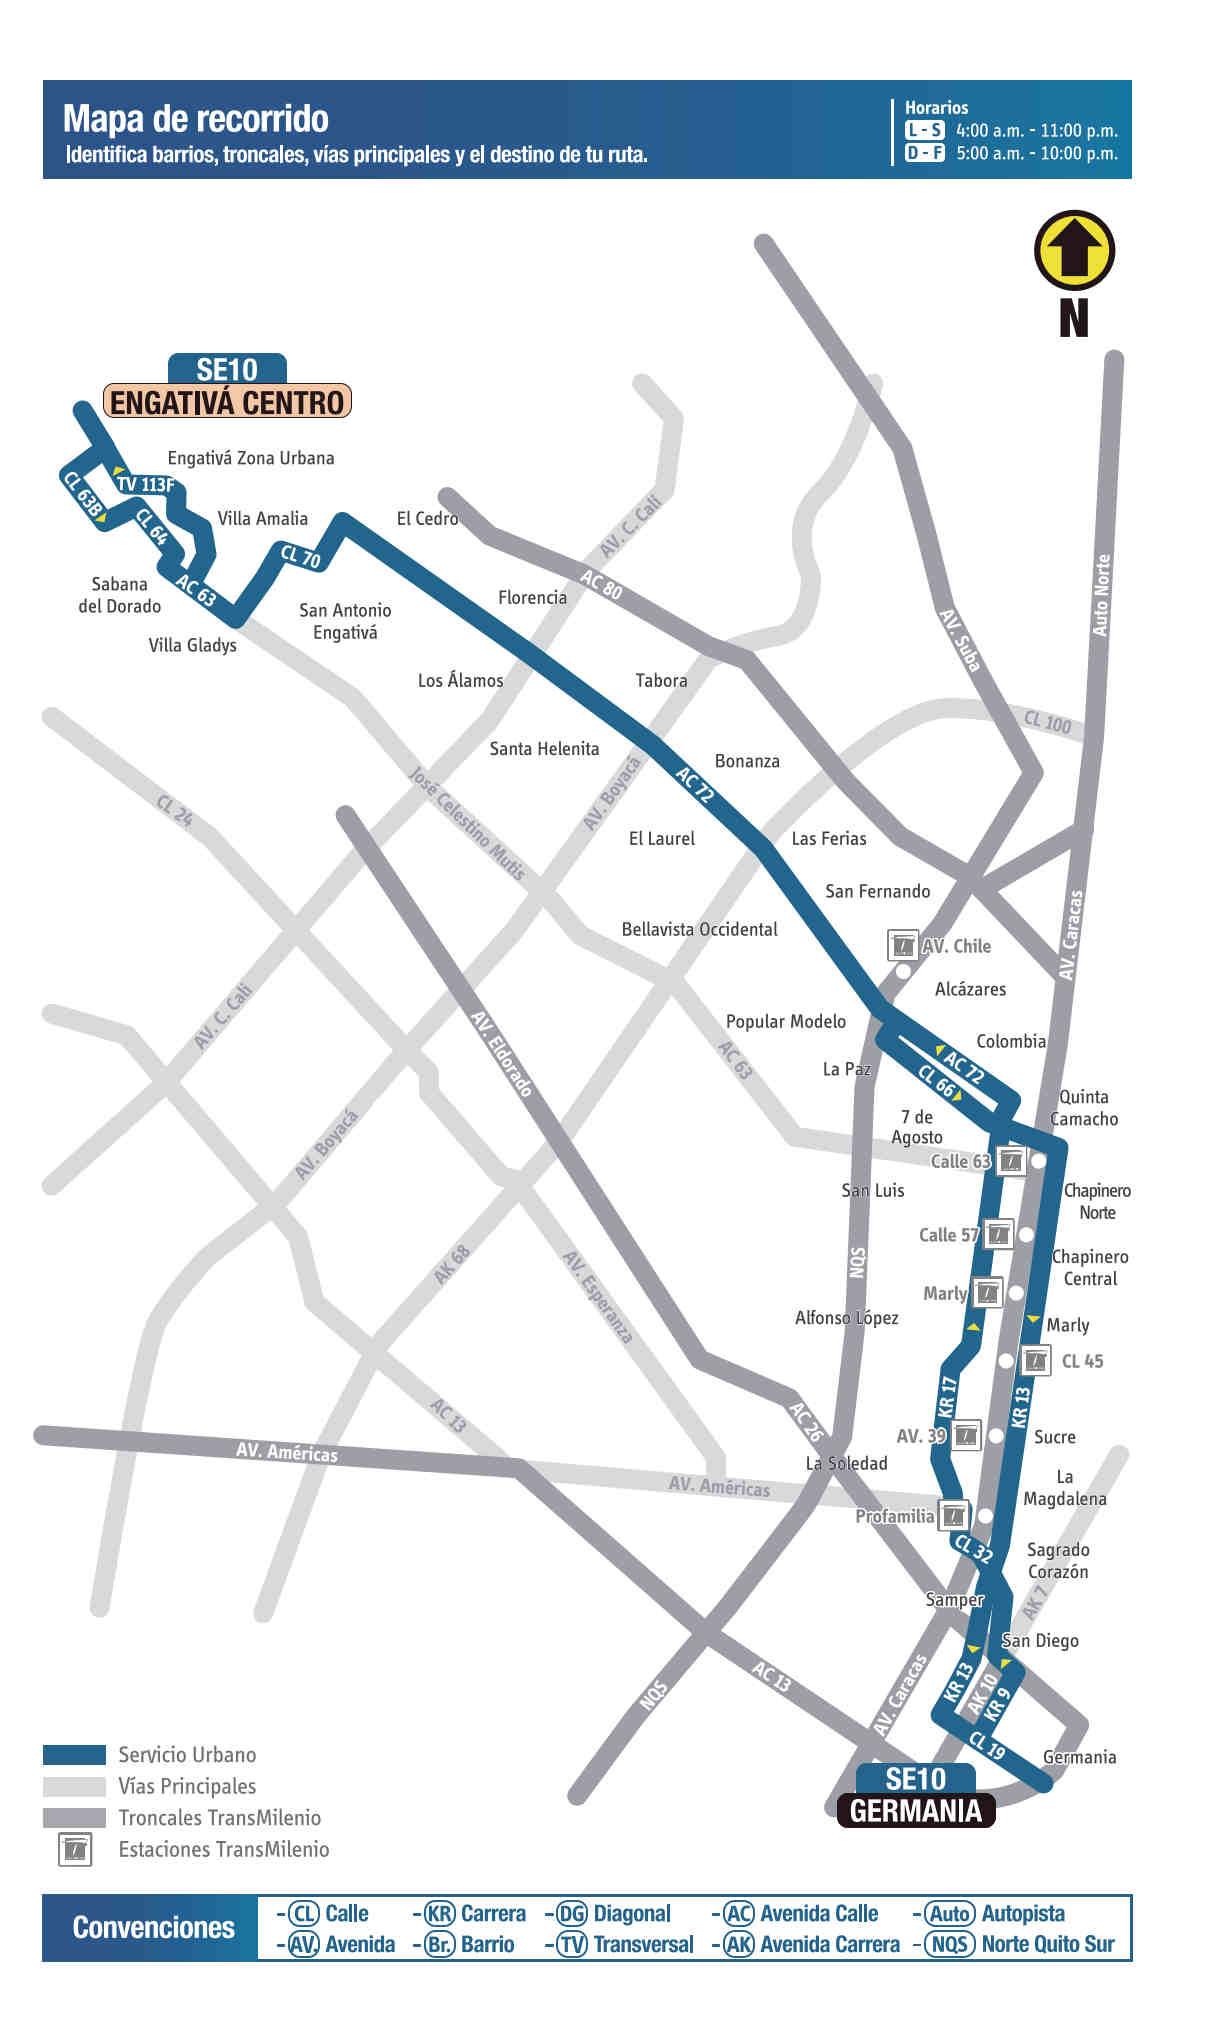 SE10 Engativá Centro - Germania, mapa bus urbano Bogotá